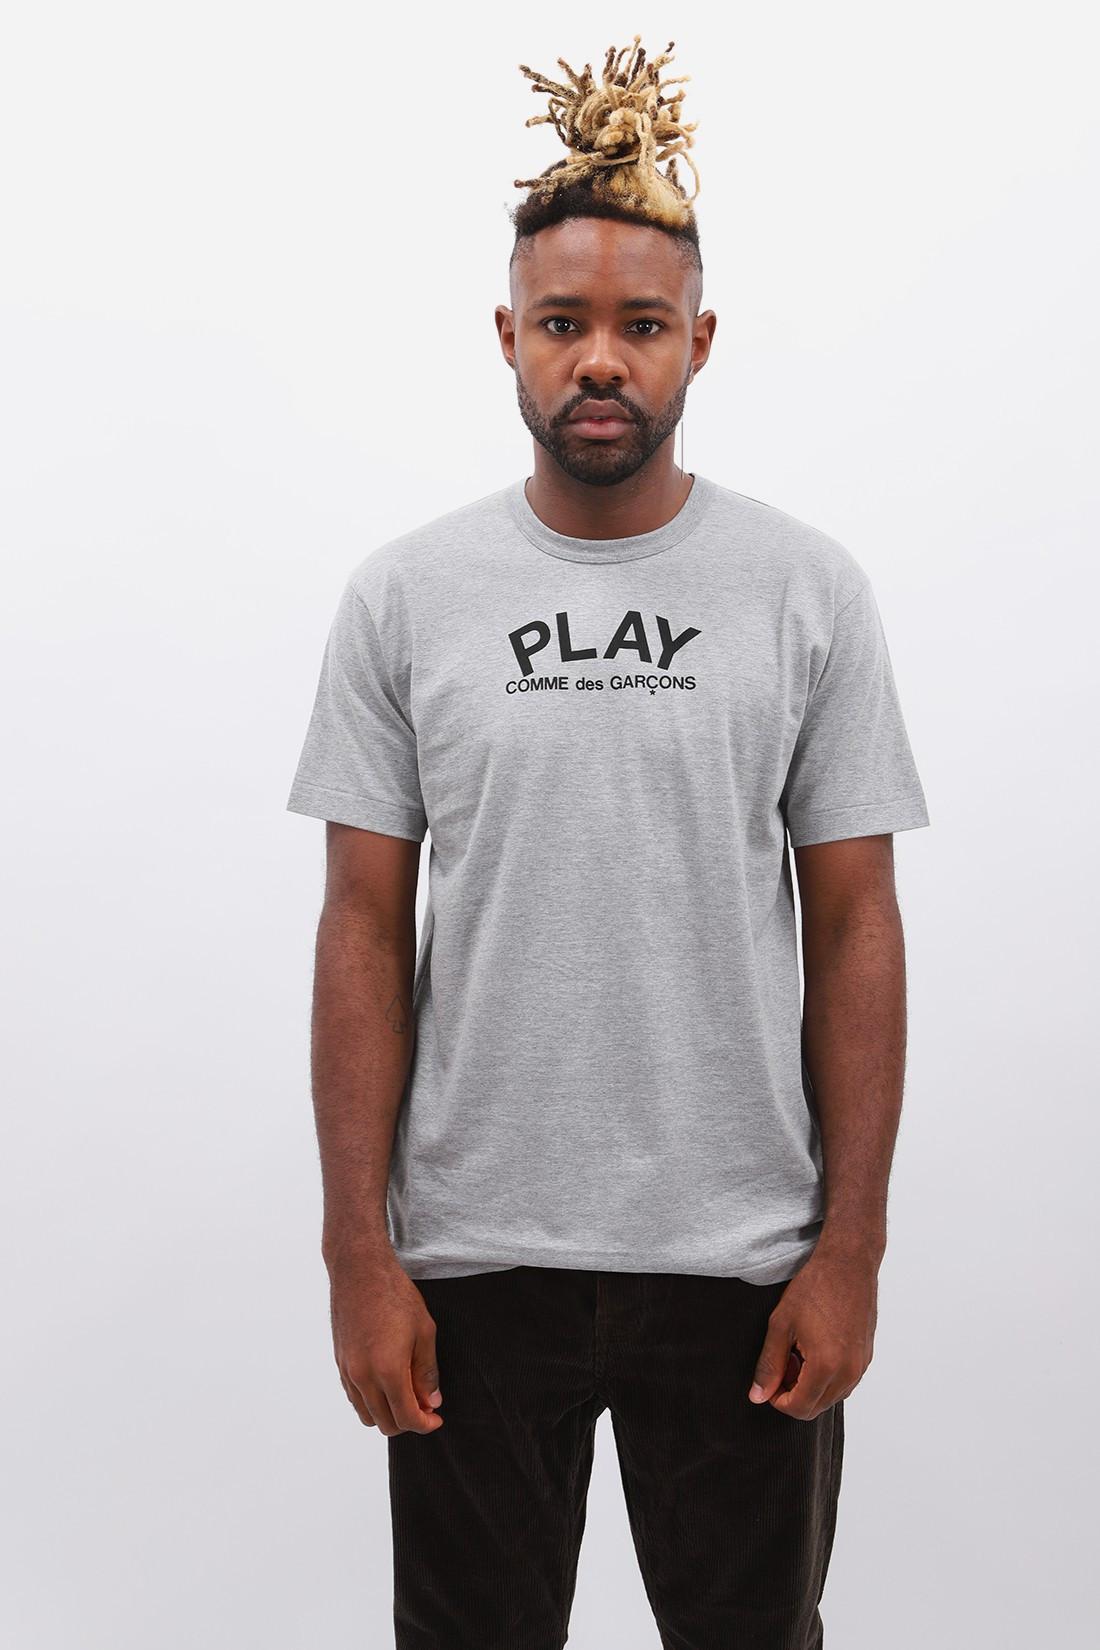 COMME DES GARÇONS PLAY / Play comme des garçons t-shirt Grey